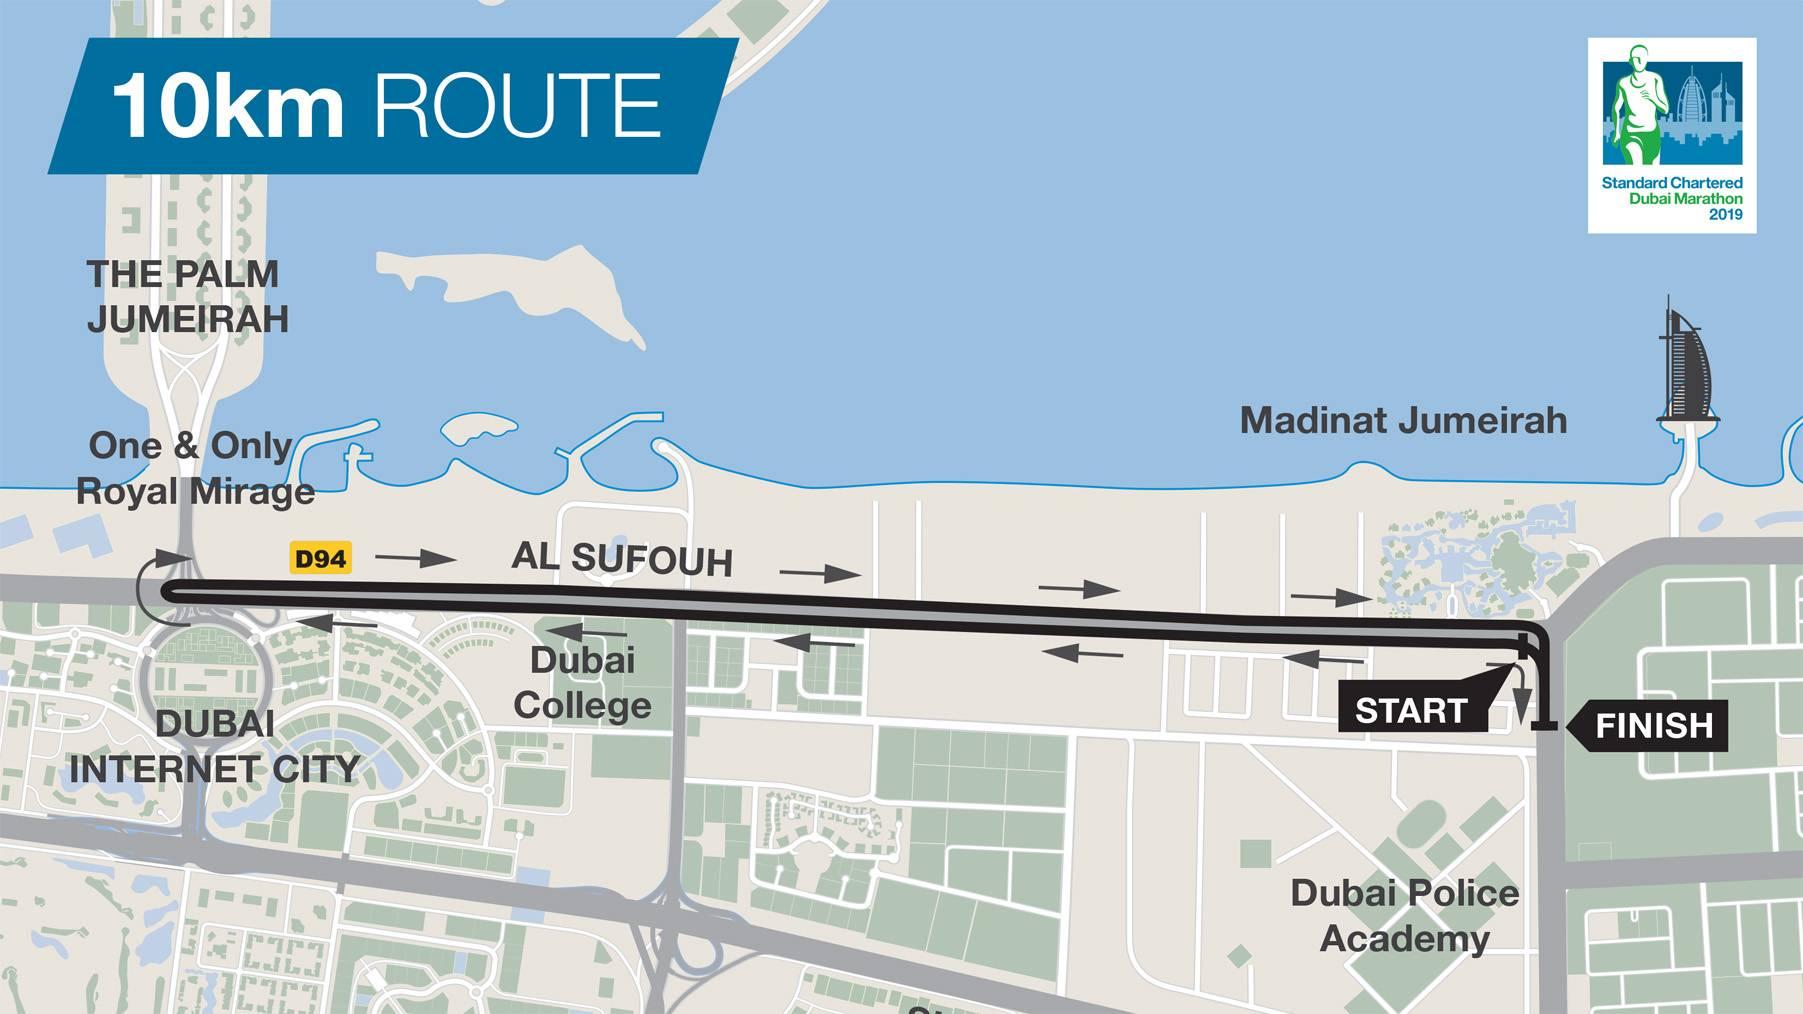 10km-route-2019.jpg